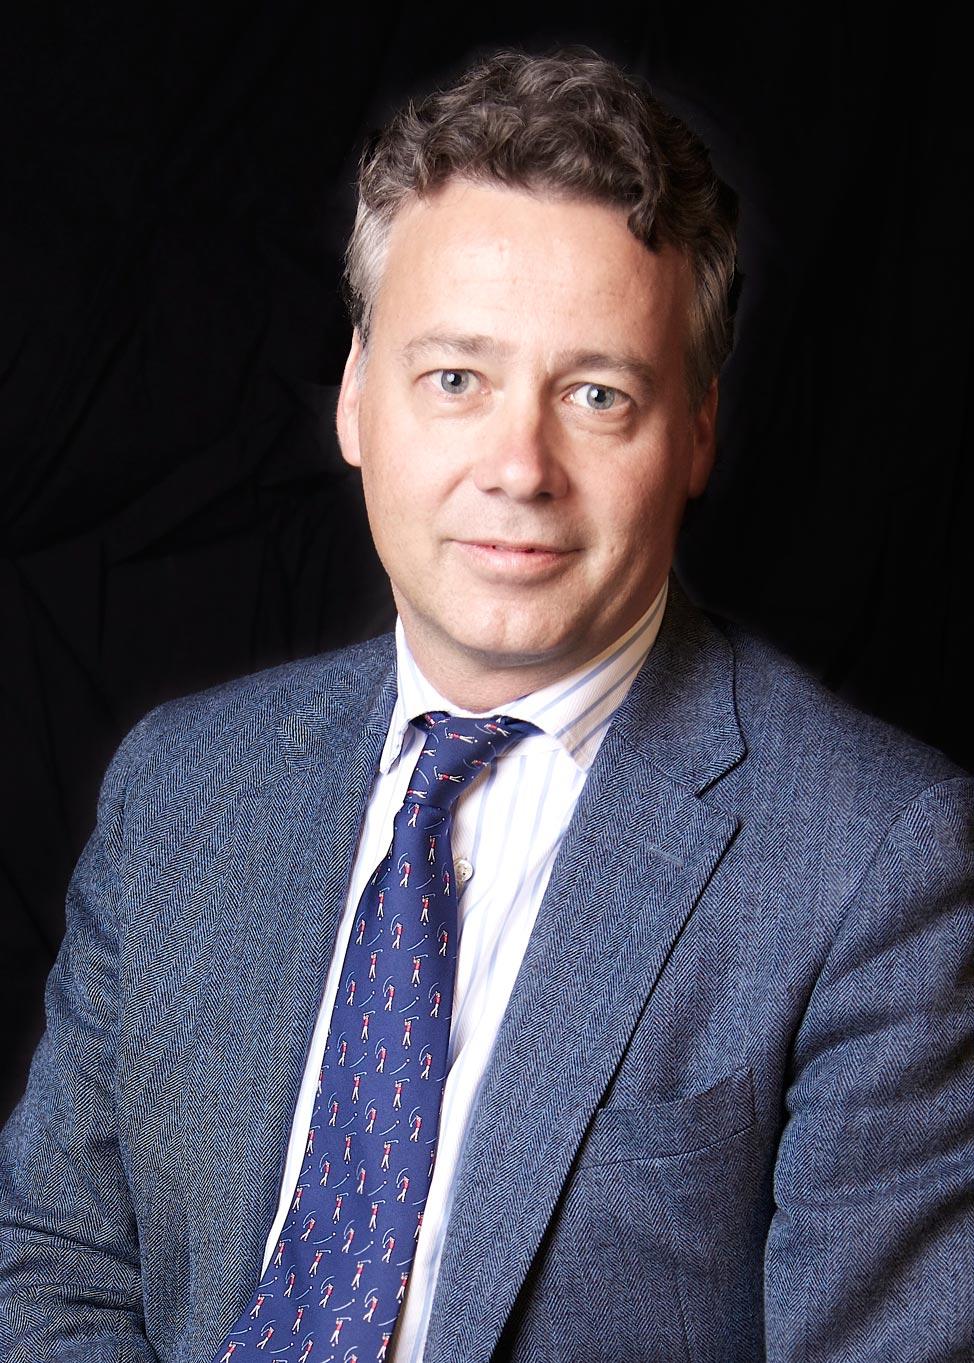 Mr. Boris Brummelhuis